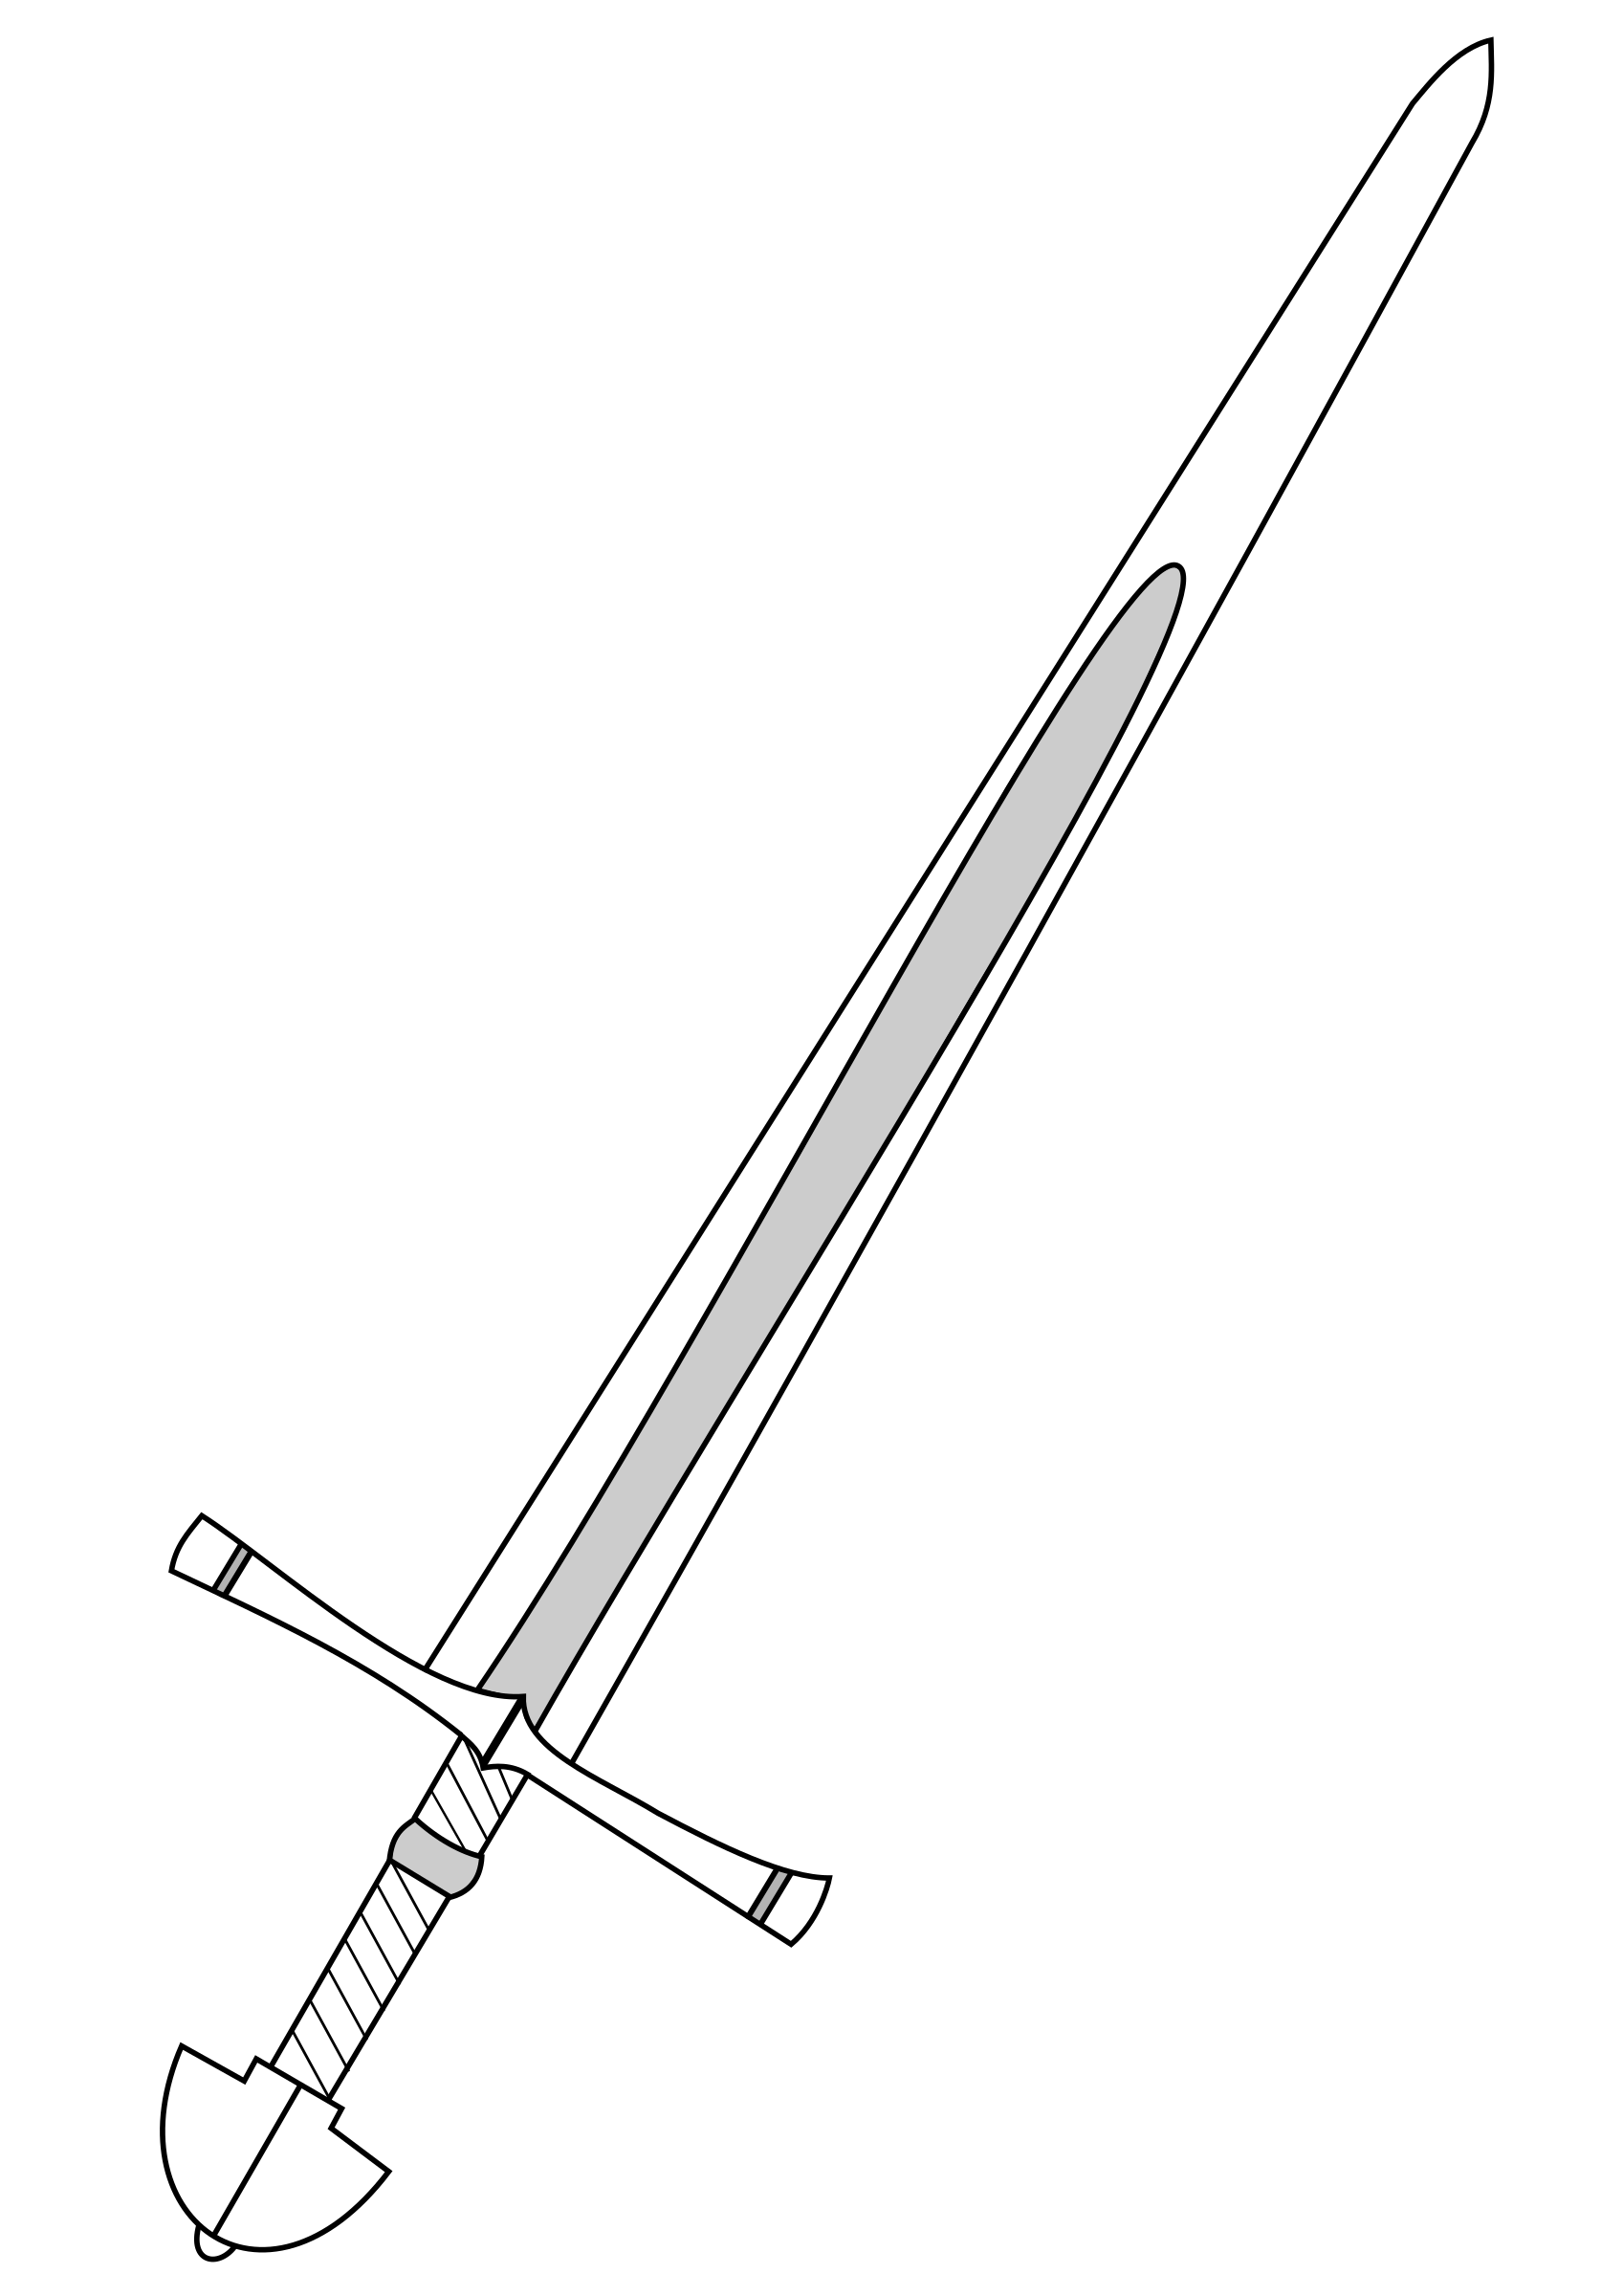 trojan sword clipart outline - HD800×1131